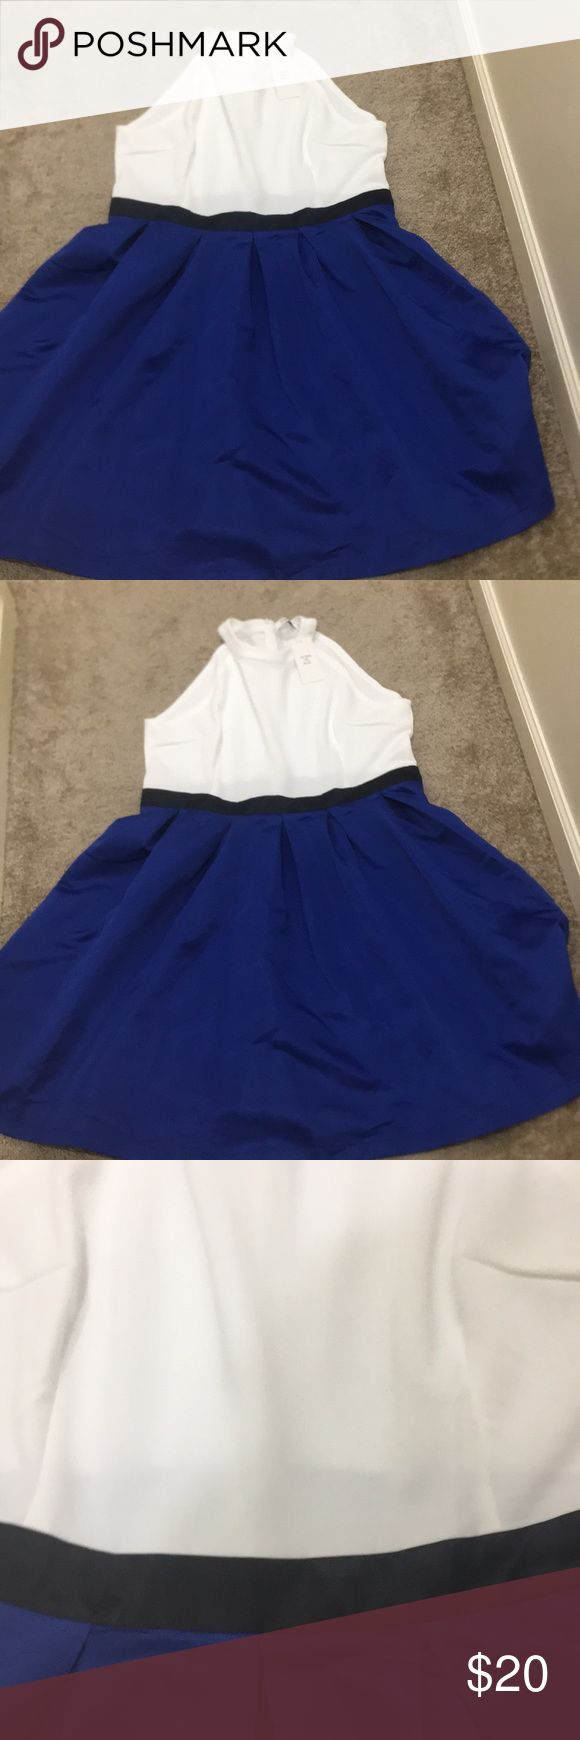 4x PLUS SIZE DRESS WORK FLOWY WHITE ROYAL BLUE NEW New STYLE LONDON Dresses Midi